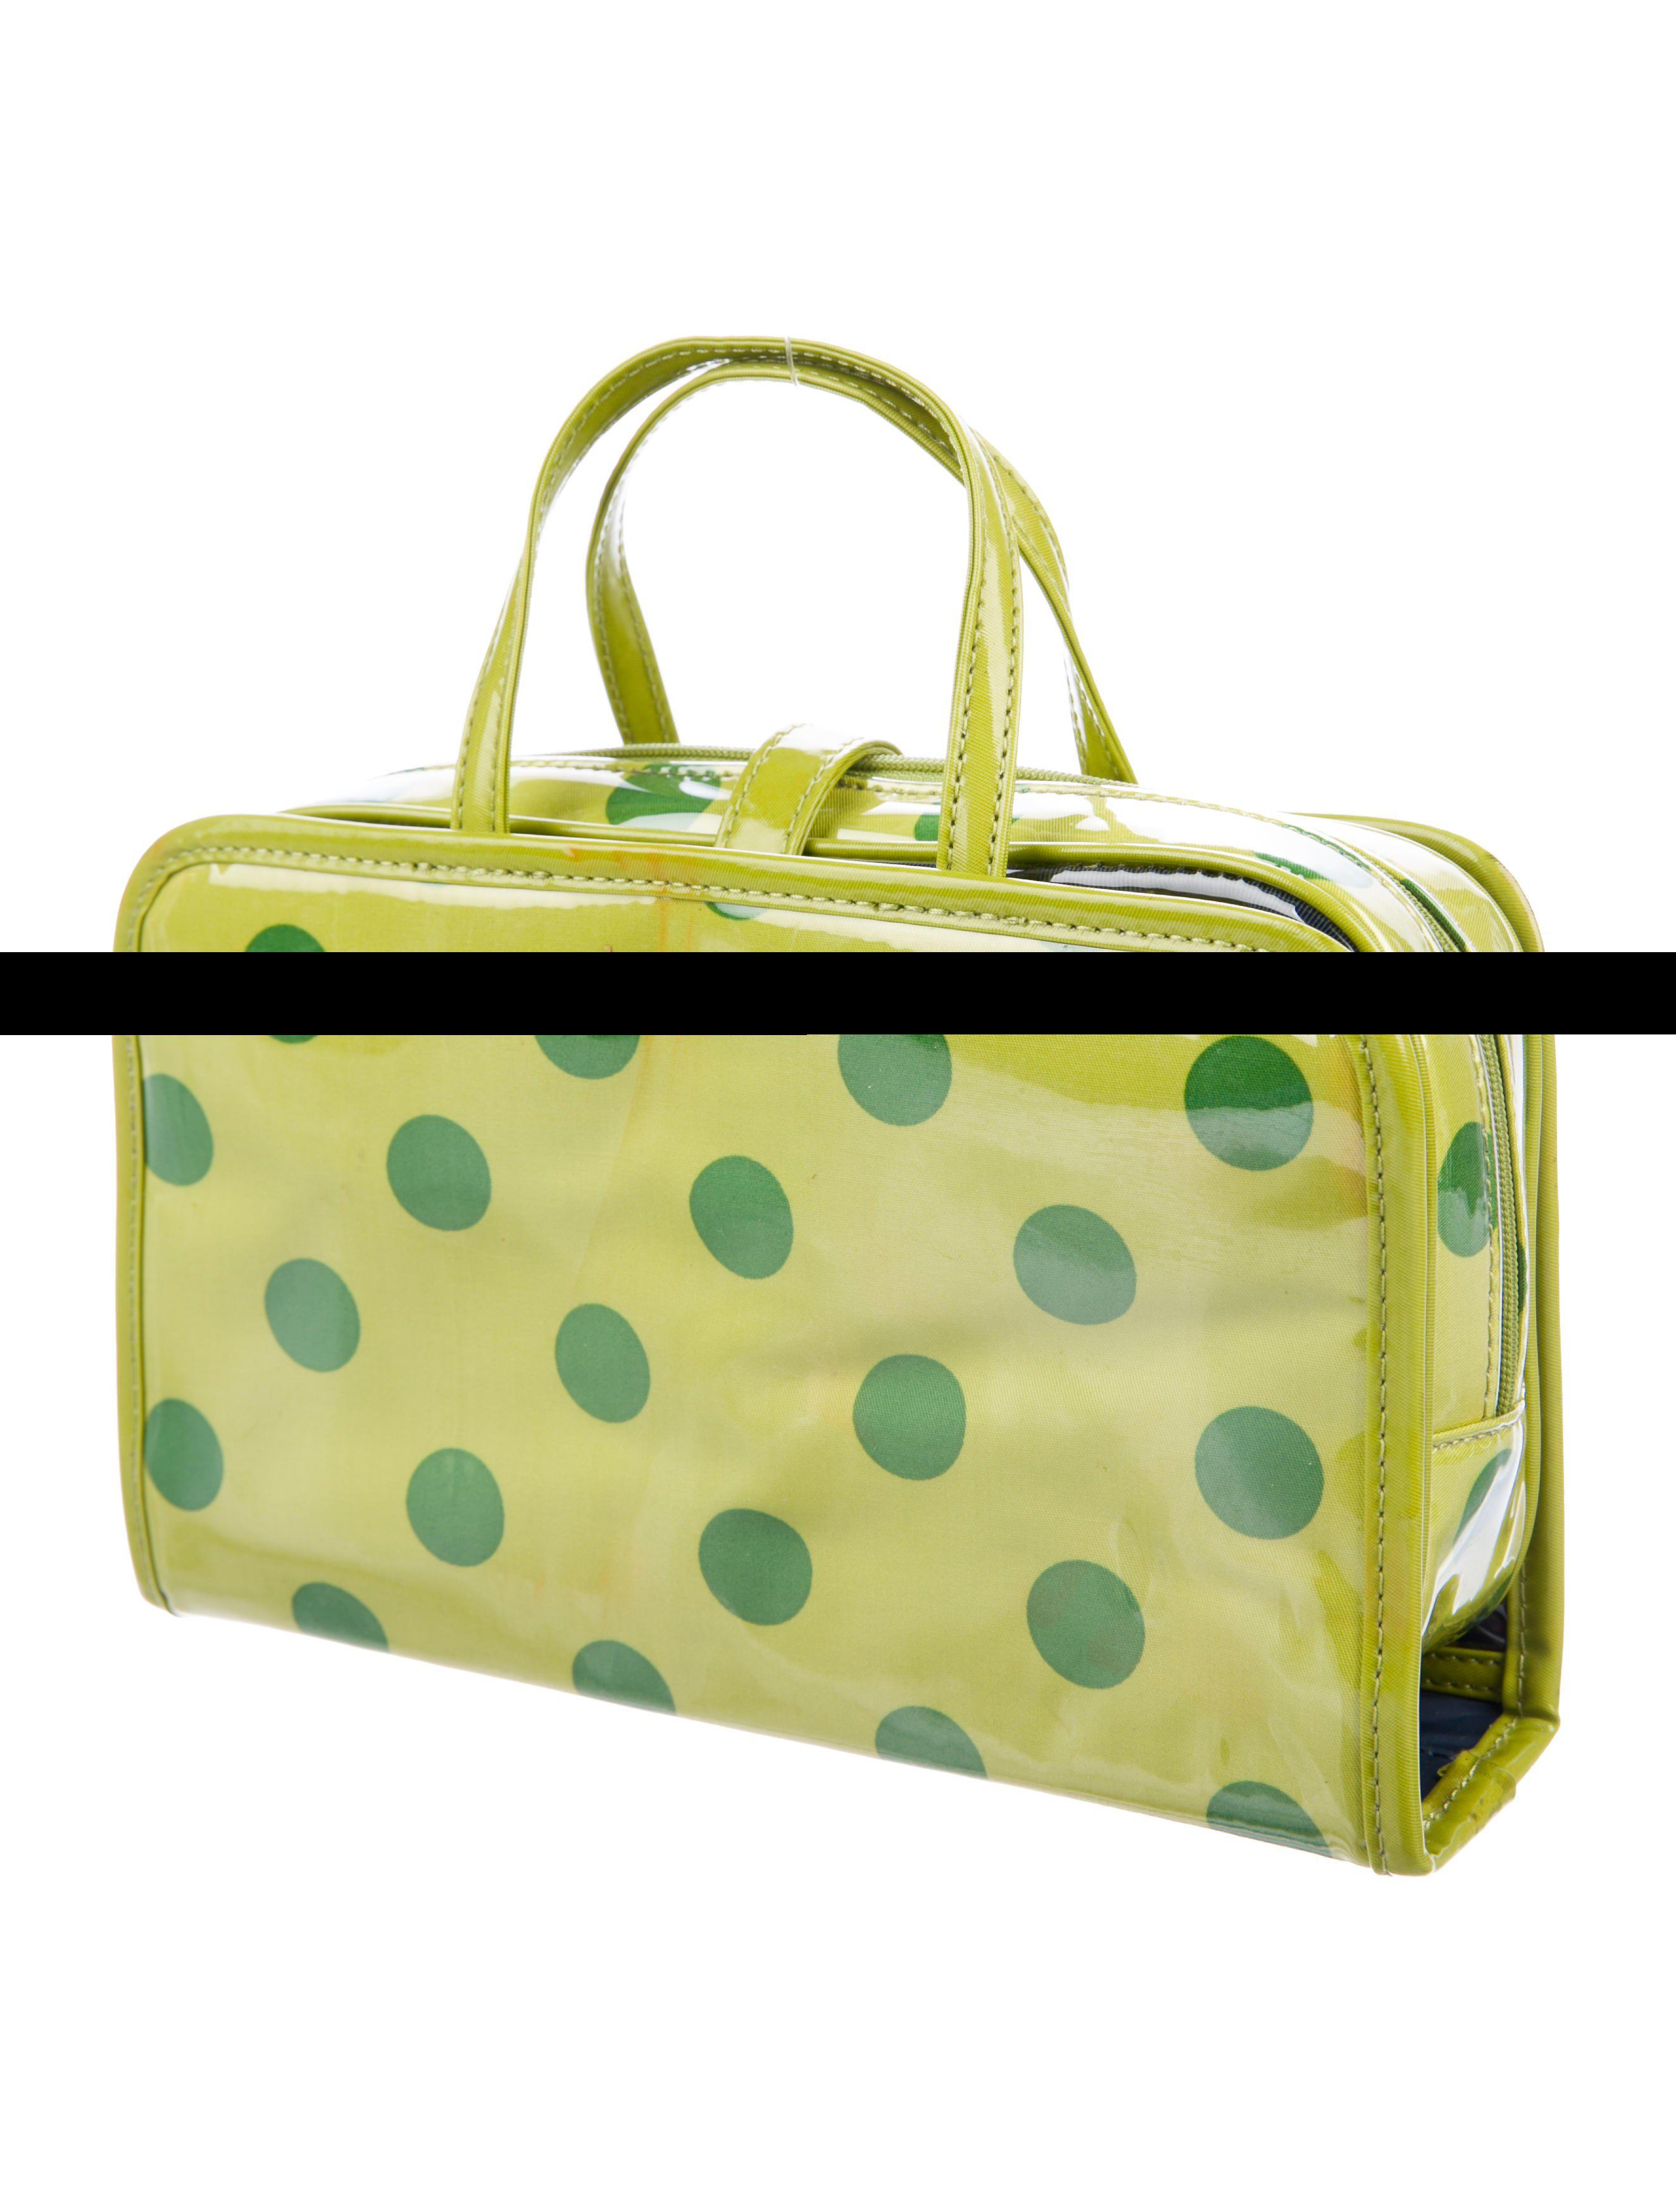 b60143c0f0 Kate Spade - Metallic Small Manuela Cosmetic Case Lime - Lyst. View  fullscreen